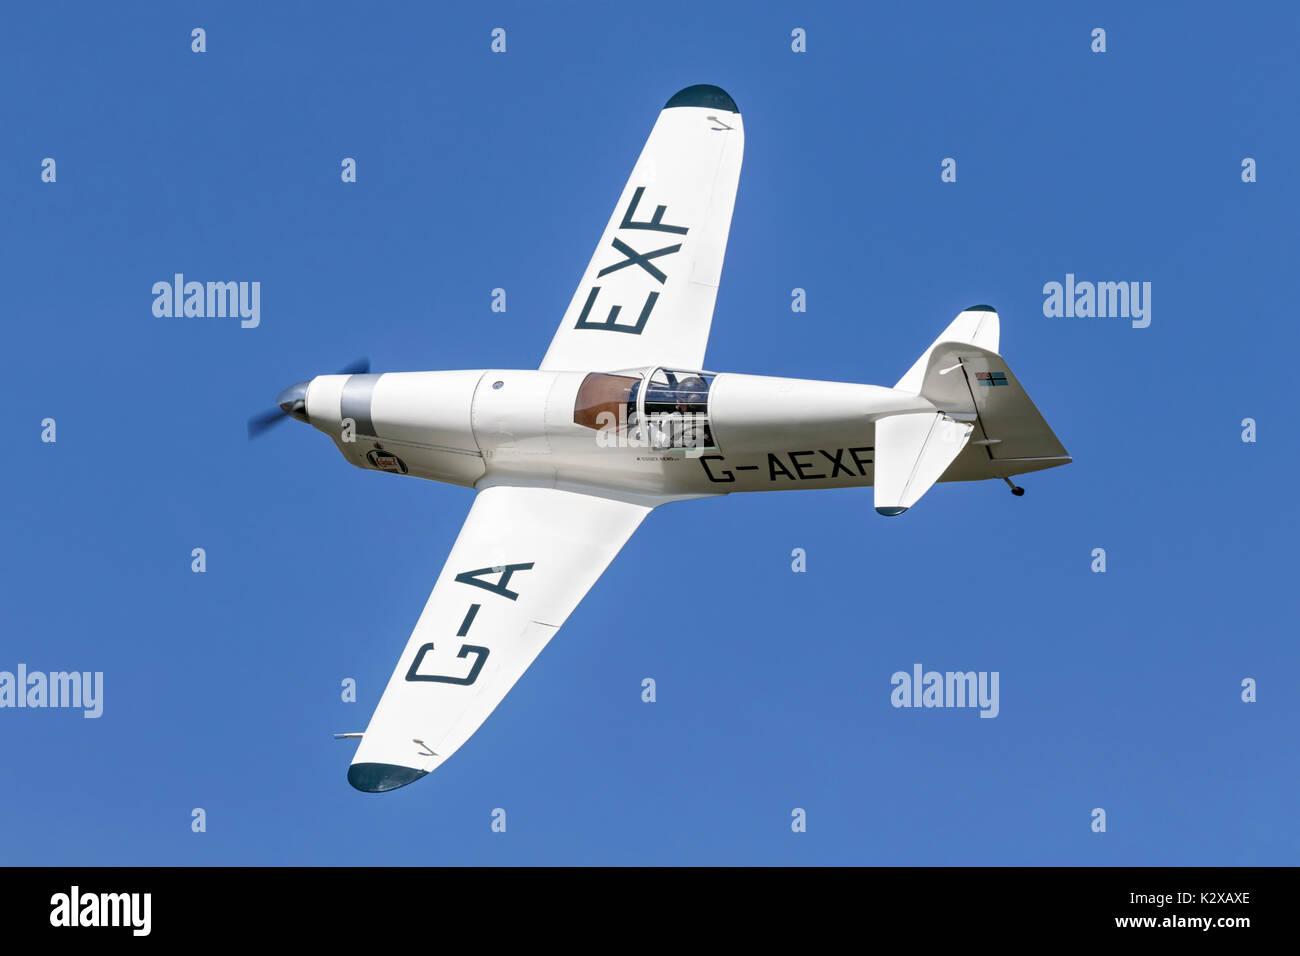 Percival Mew Gull racing aircraft - Stock Image